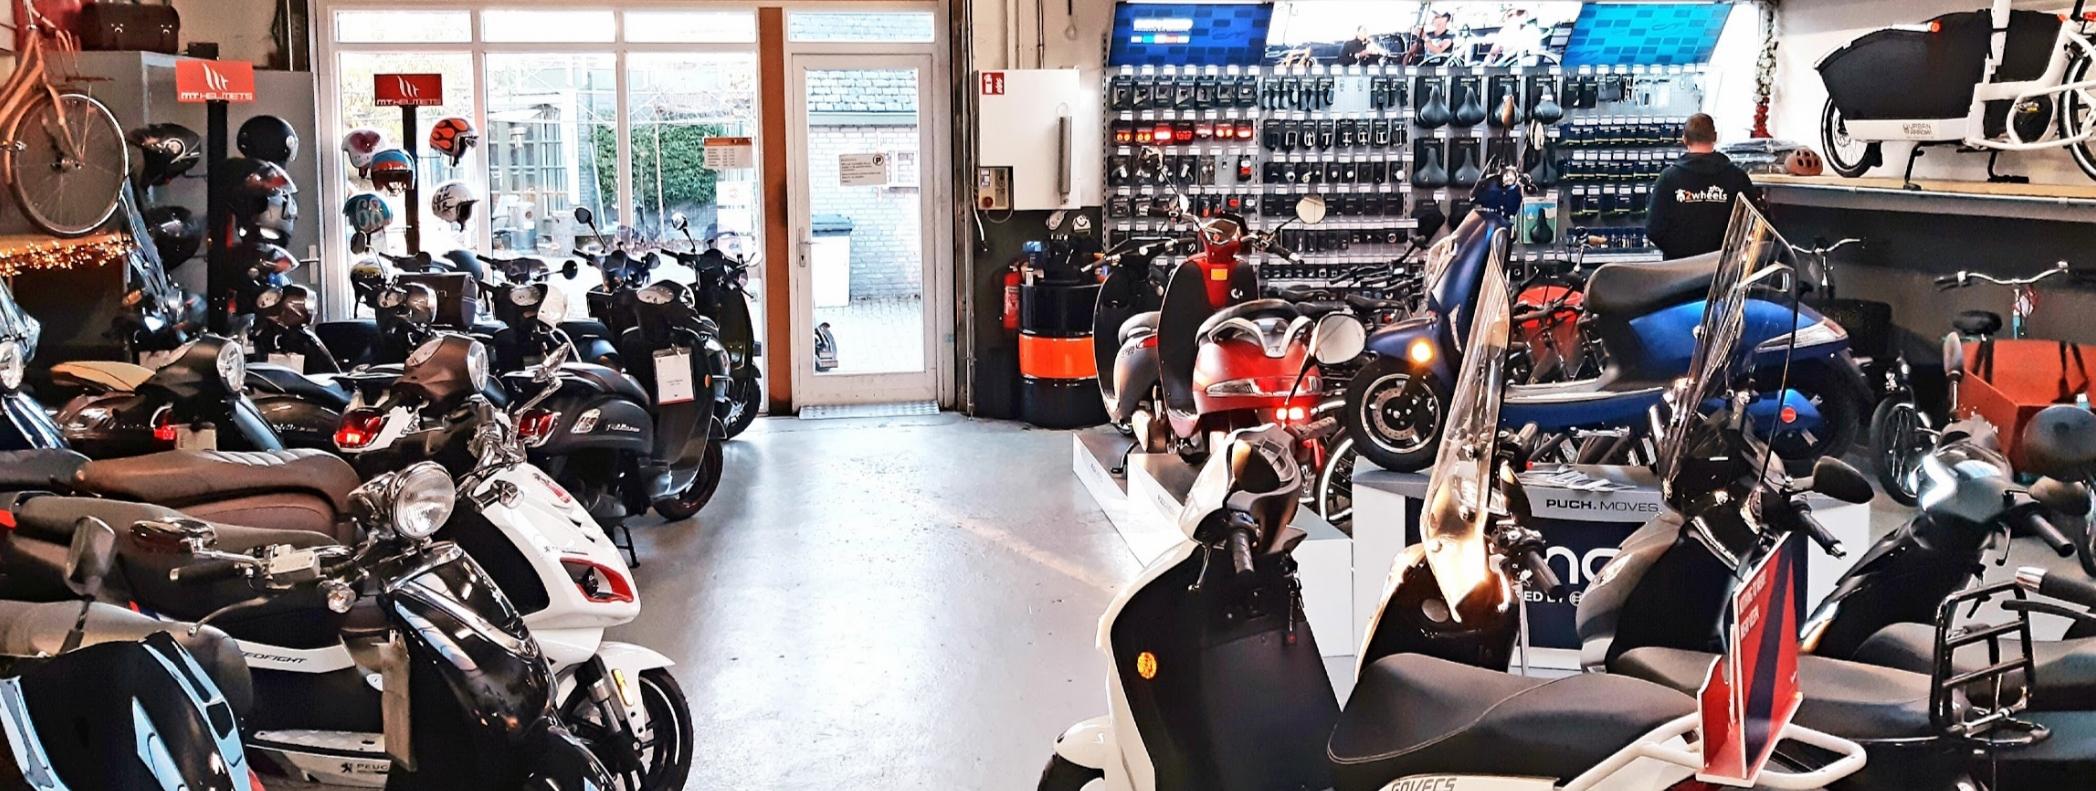 Piaggio Vespa scooter onderdelen webshop gratis